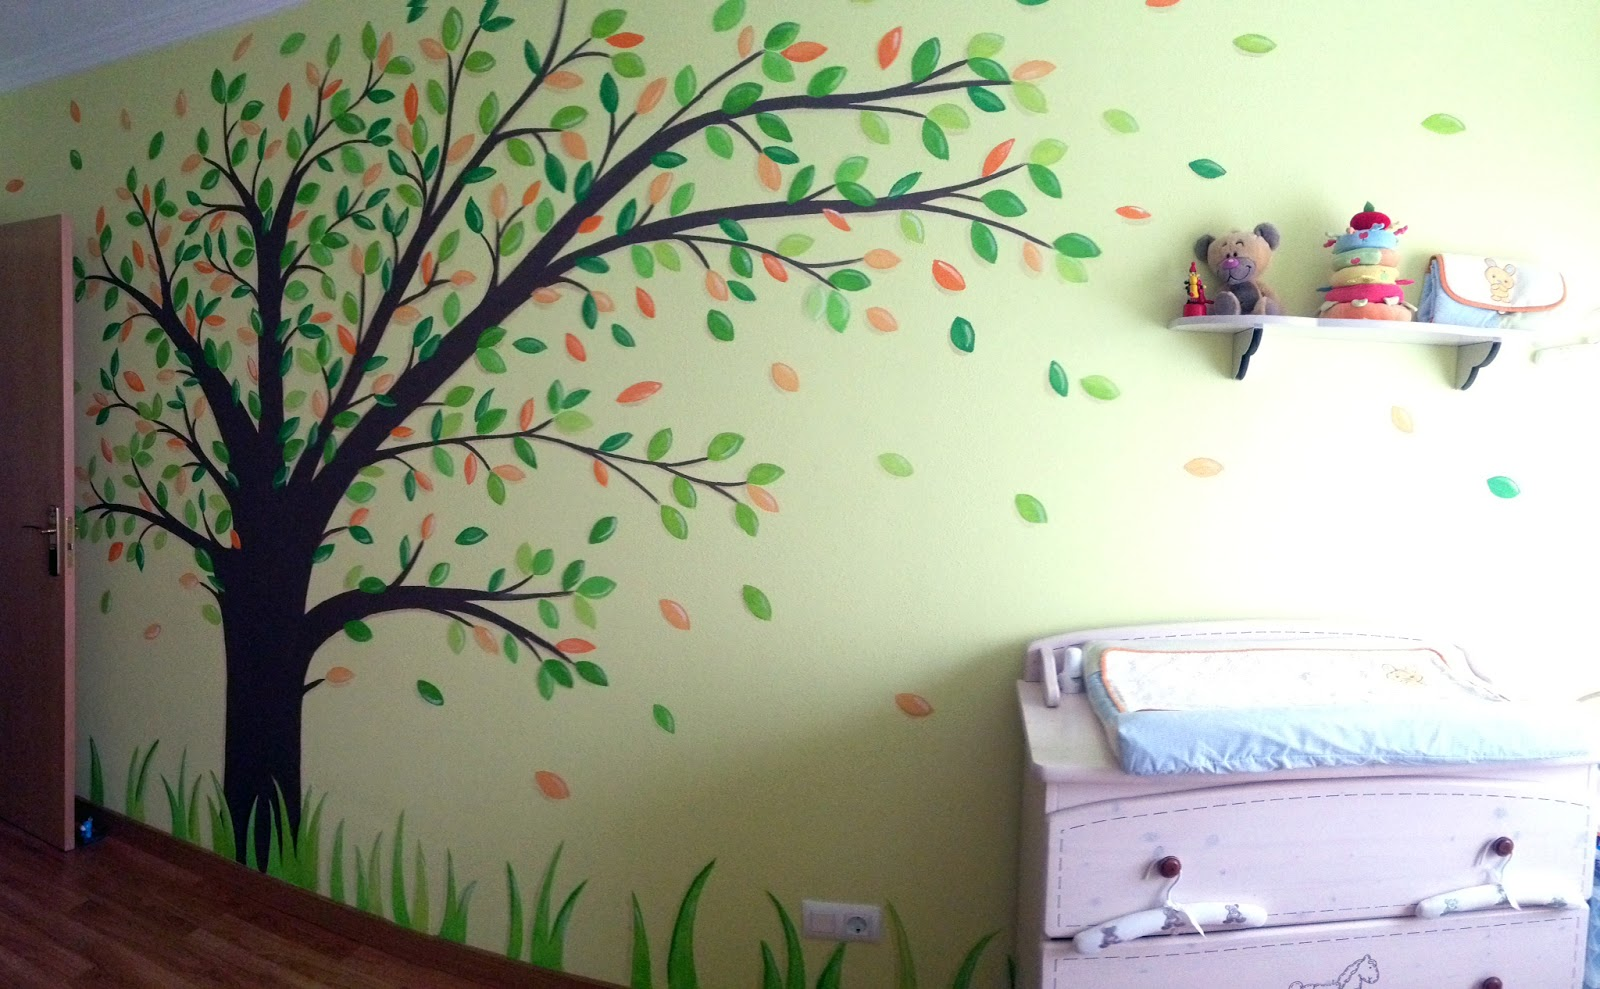 decopared murales infantiles pintados en paredes